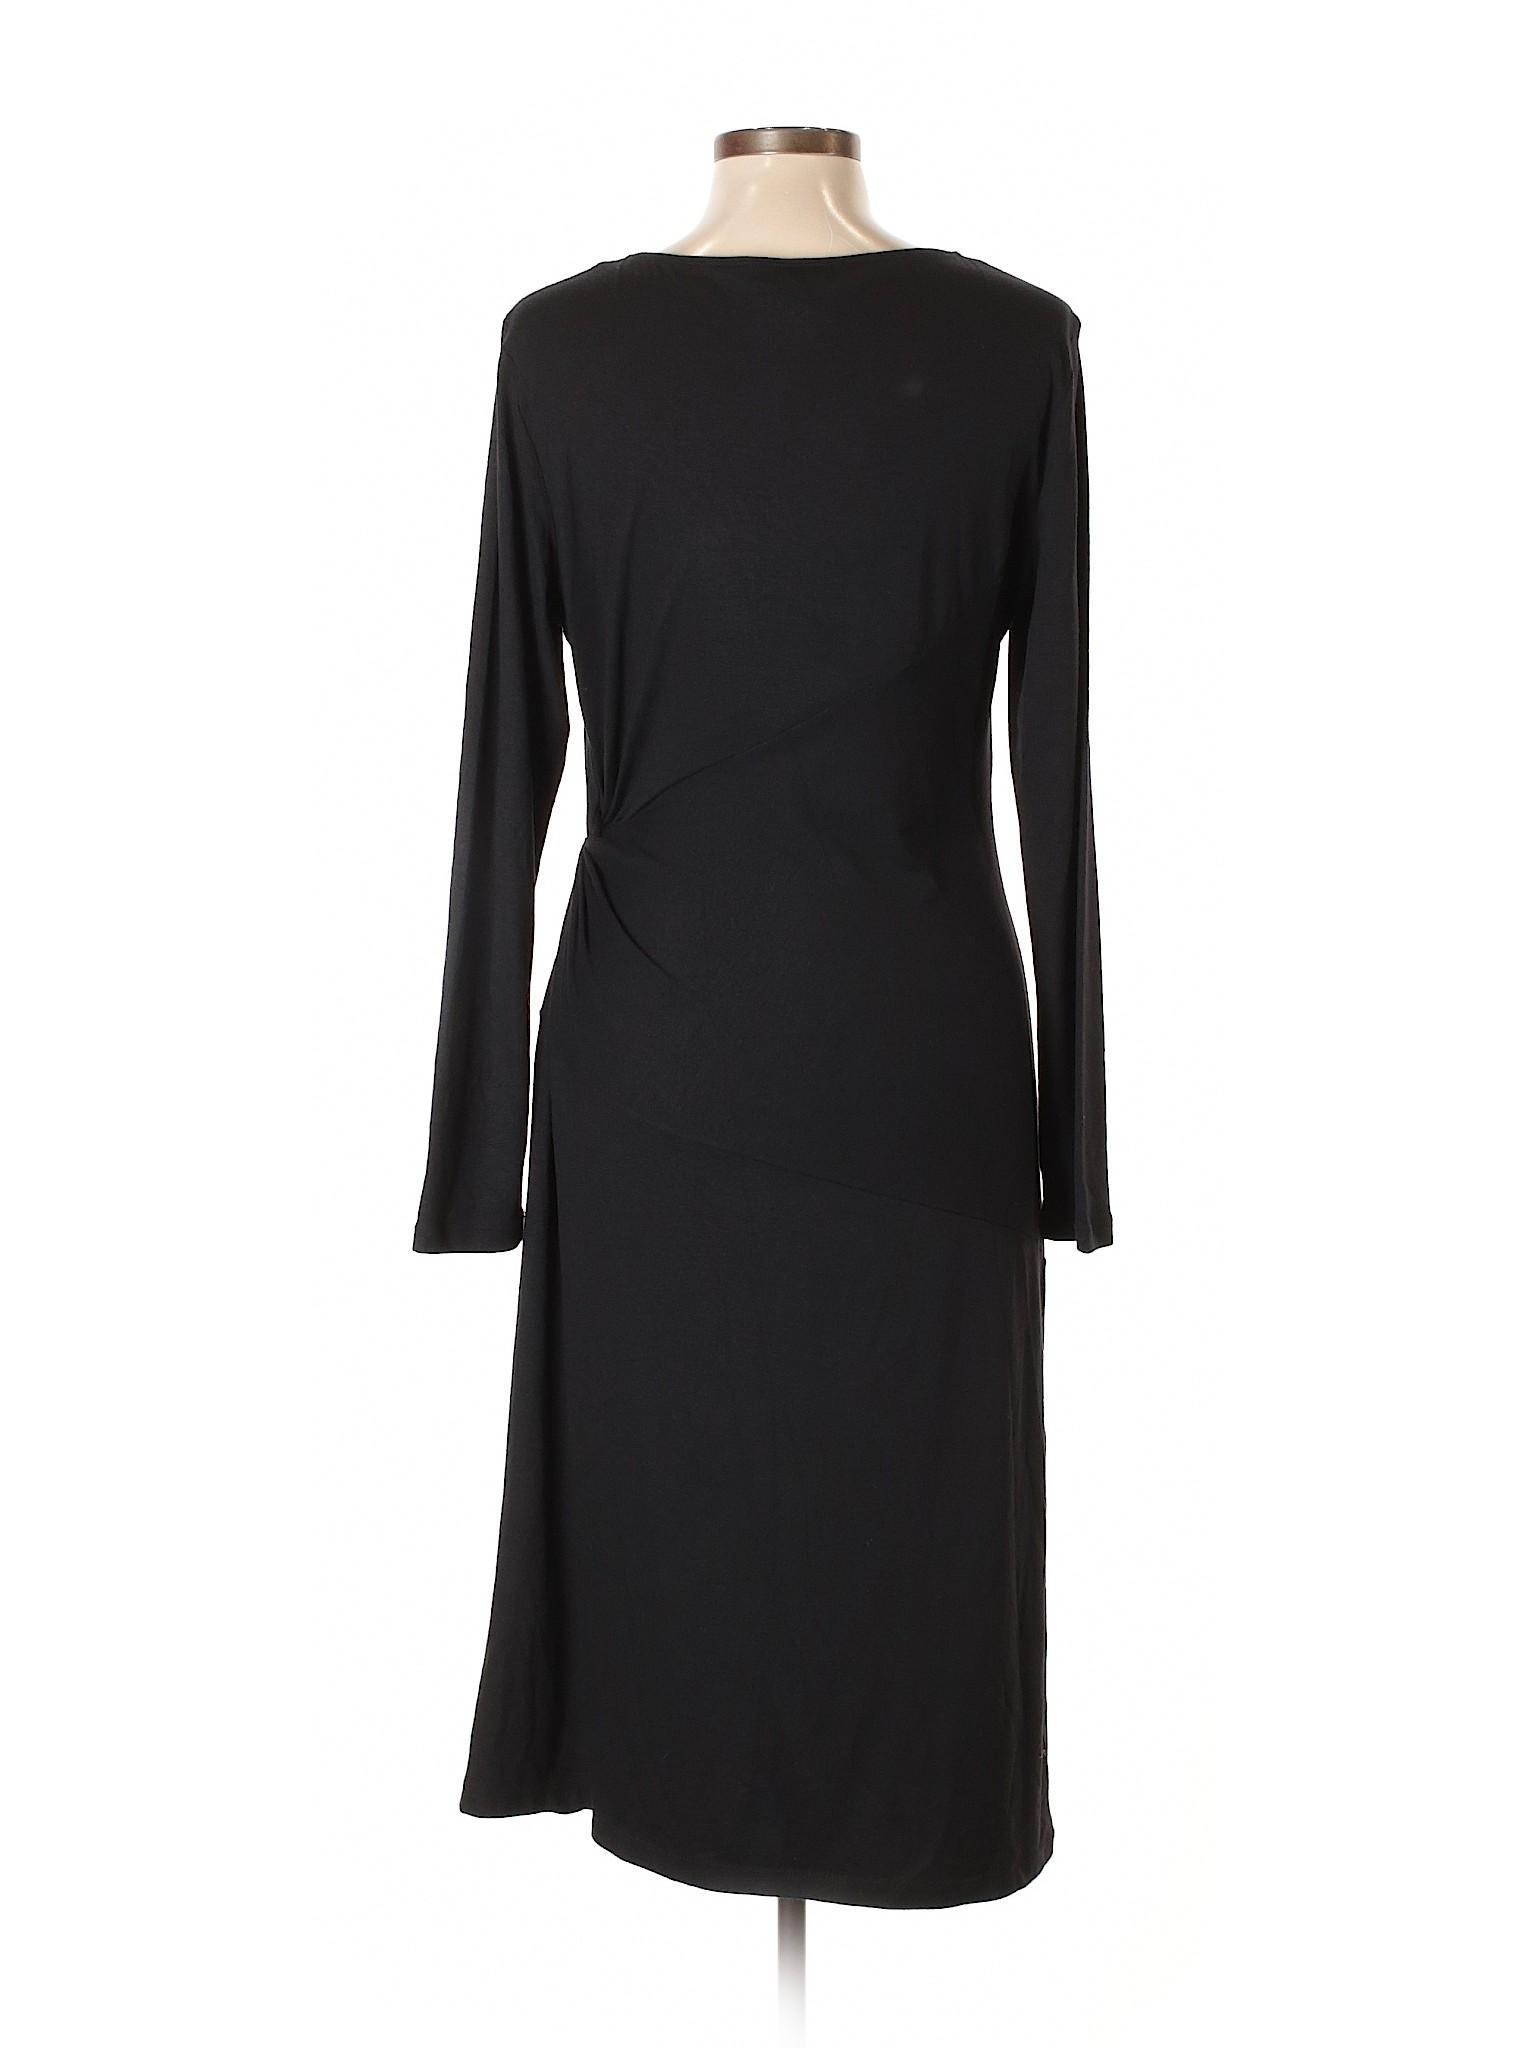 Dress Anne winter Casual Boutique Klein x76YwI5Fq